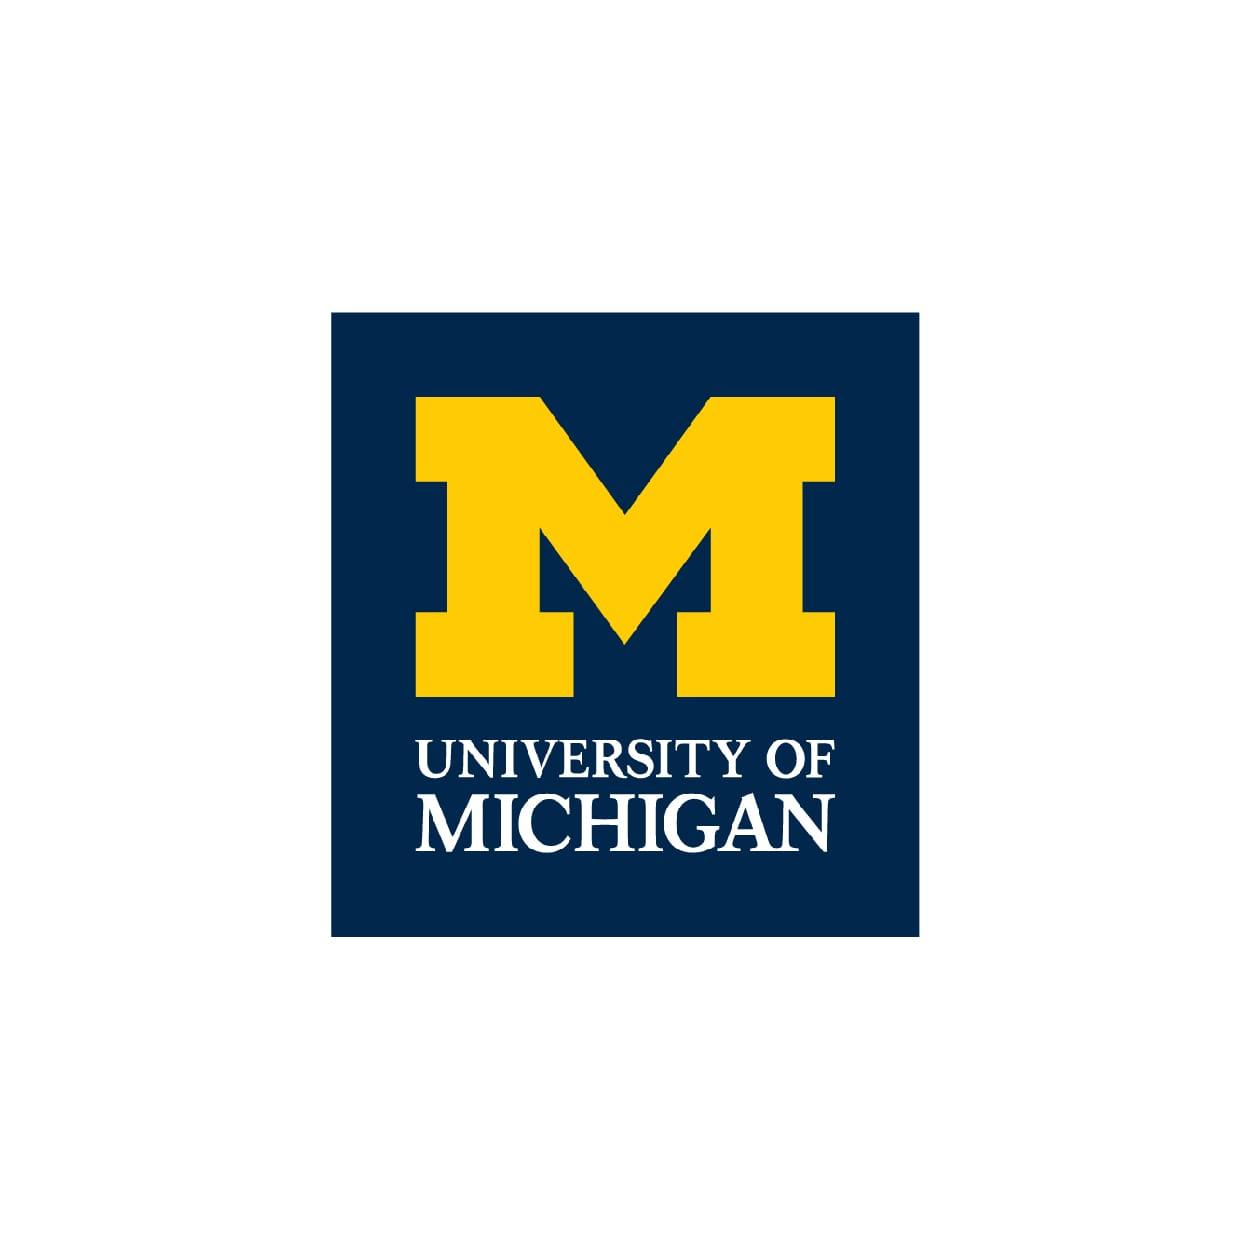 The University of Michigan,